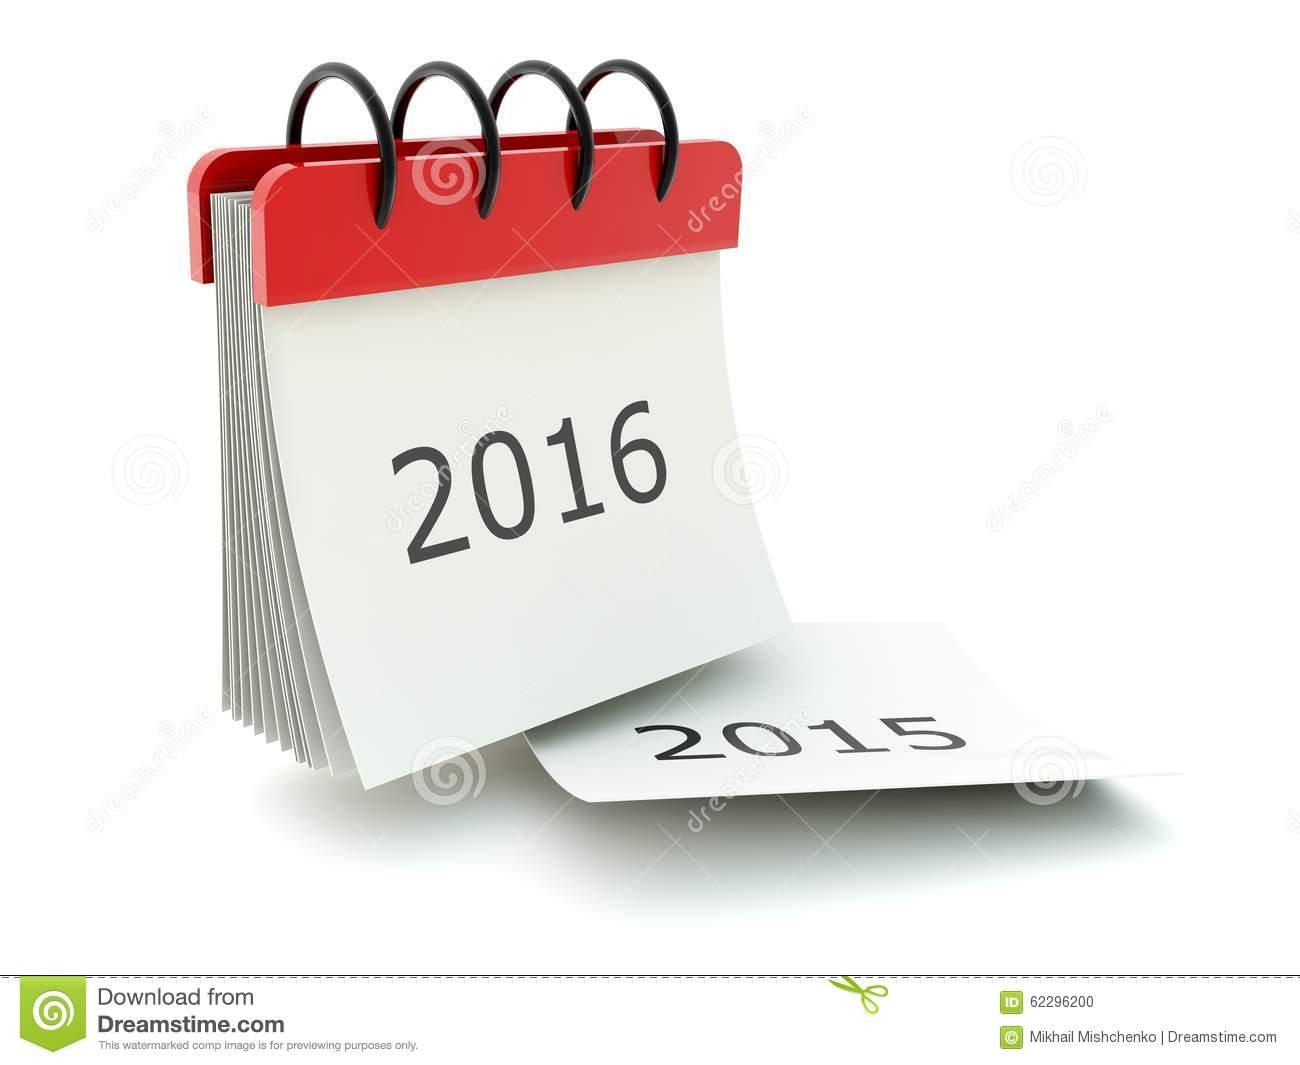 2016 New Year Calendar Icon Stock Illustration.